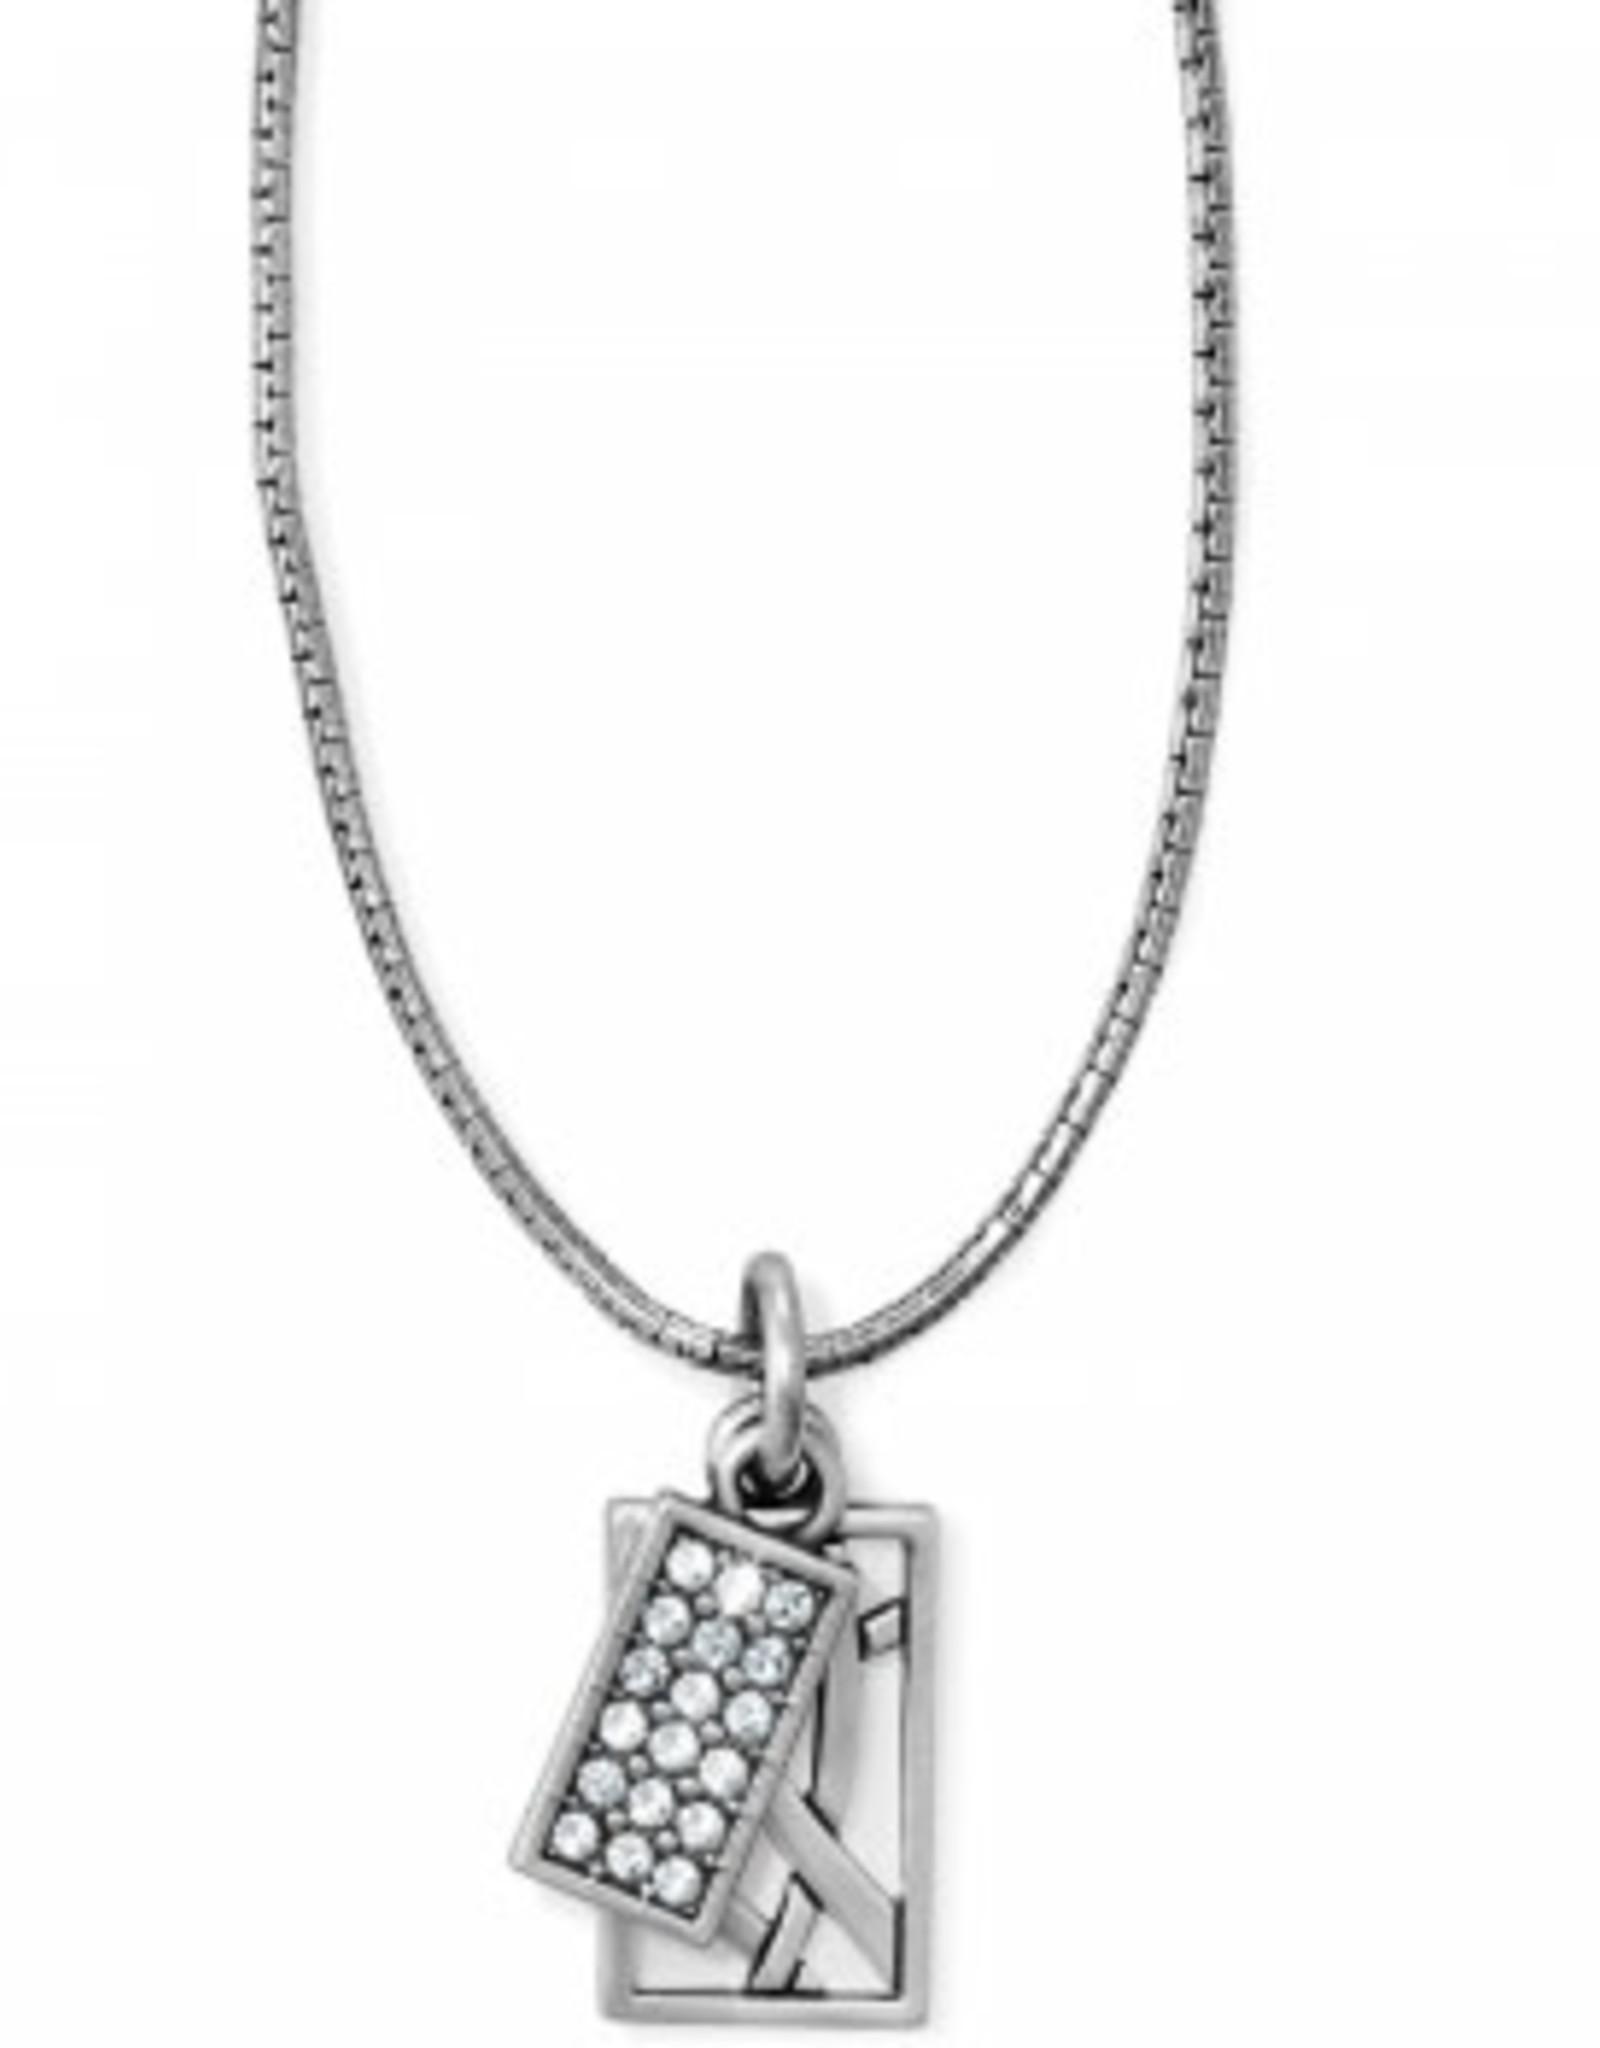 Brighton Brighton, Meridian Zenith Charm Necklace, Silver